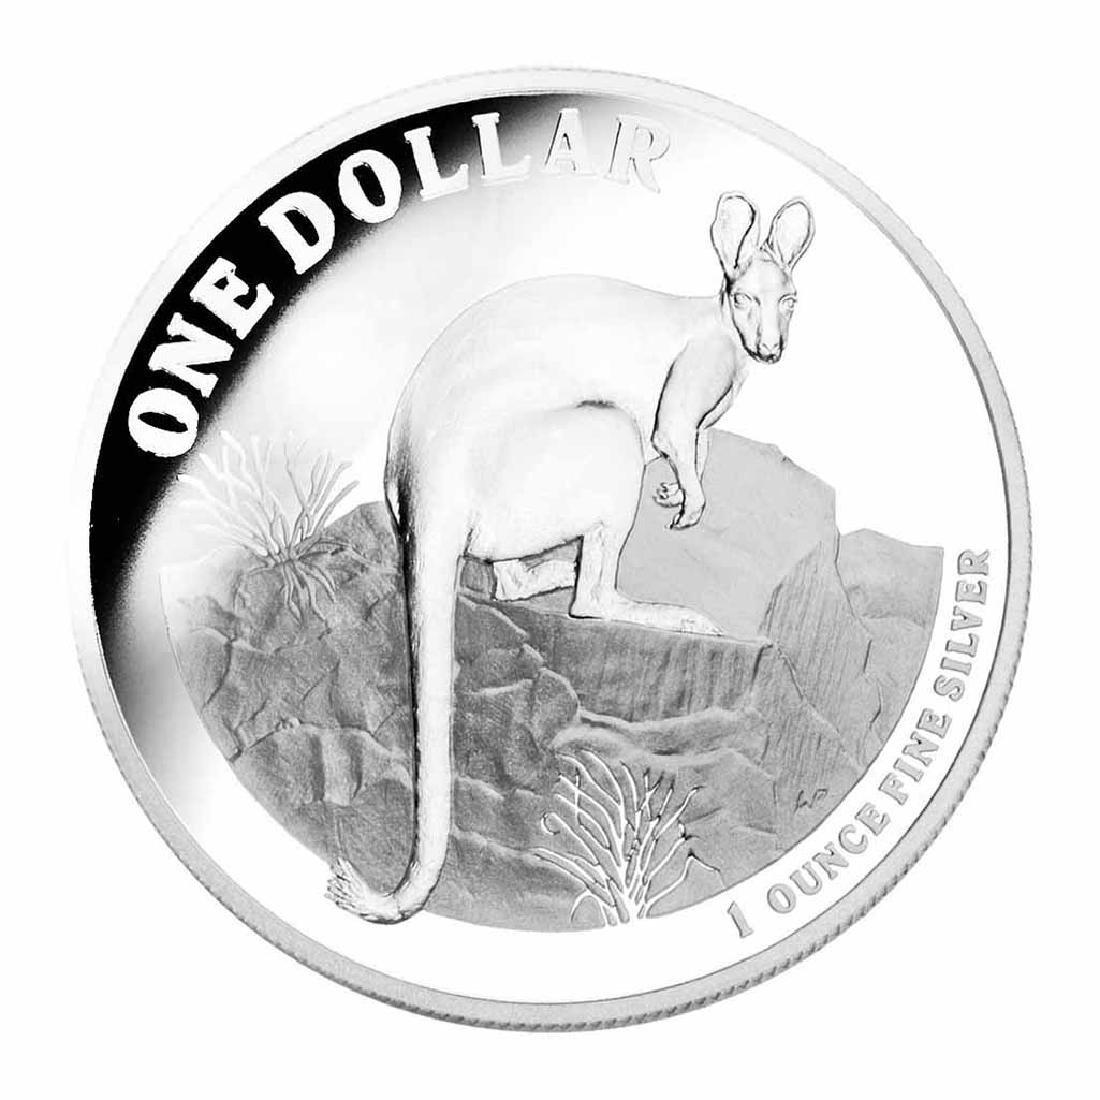 Australian Kangaroo 1 oz. Silver 2010 Proof